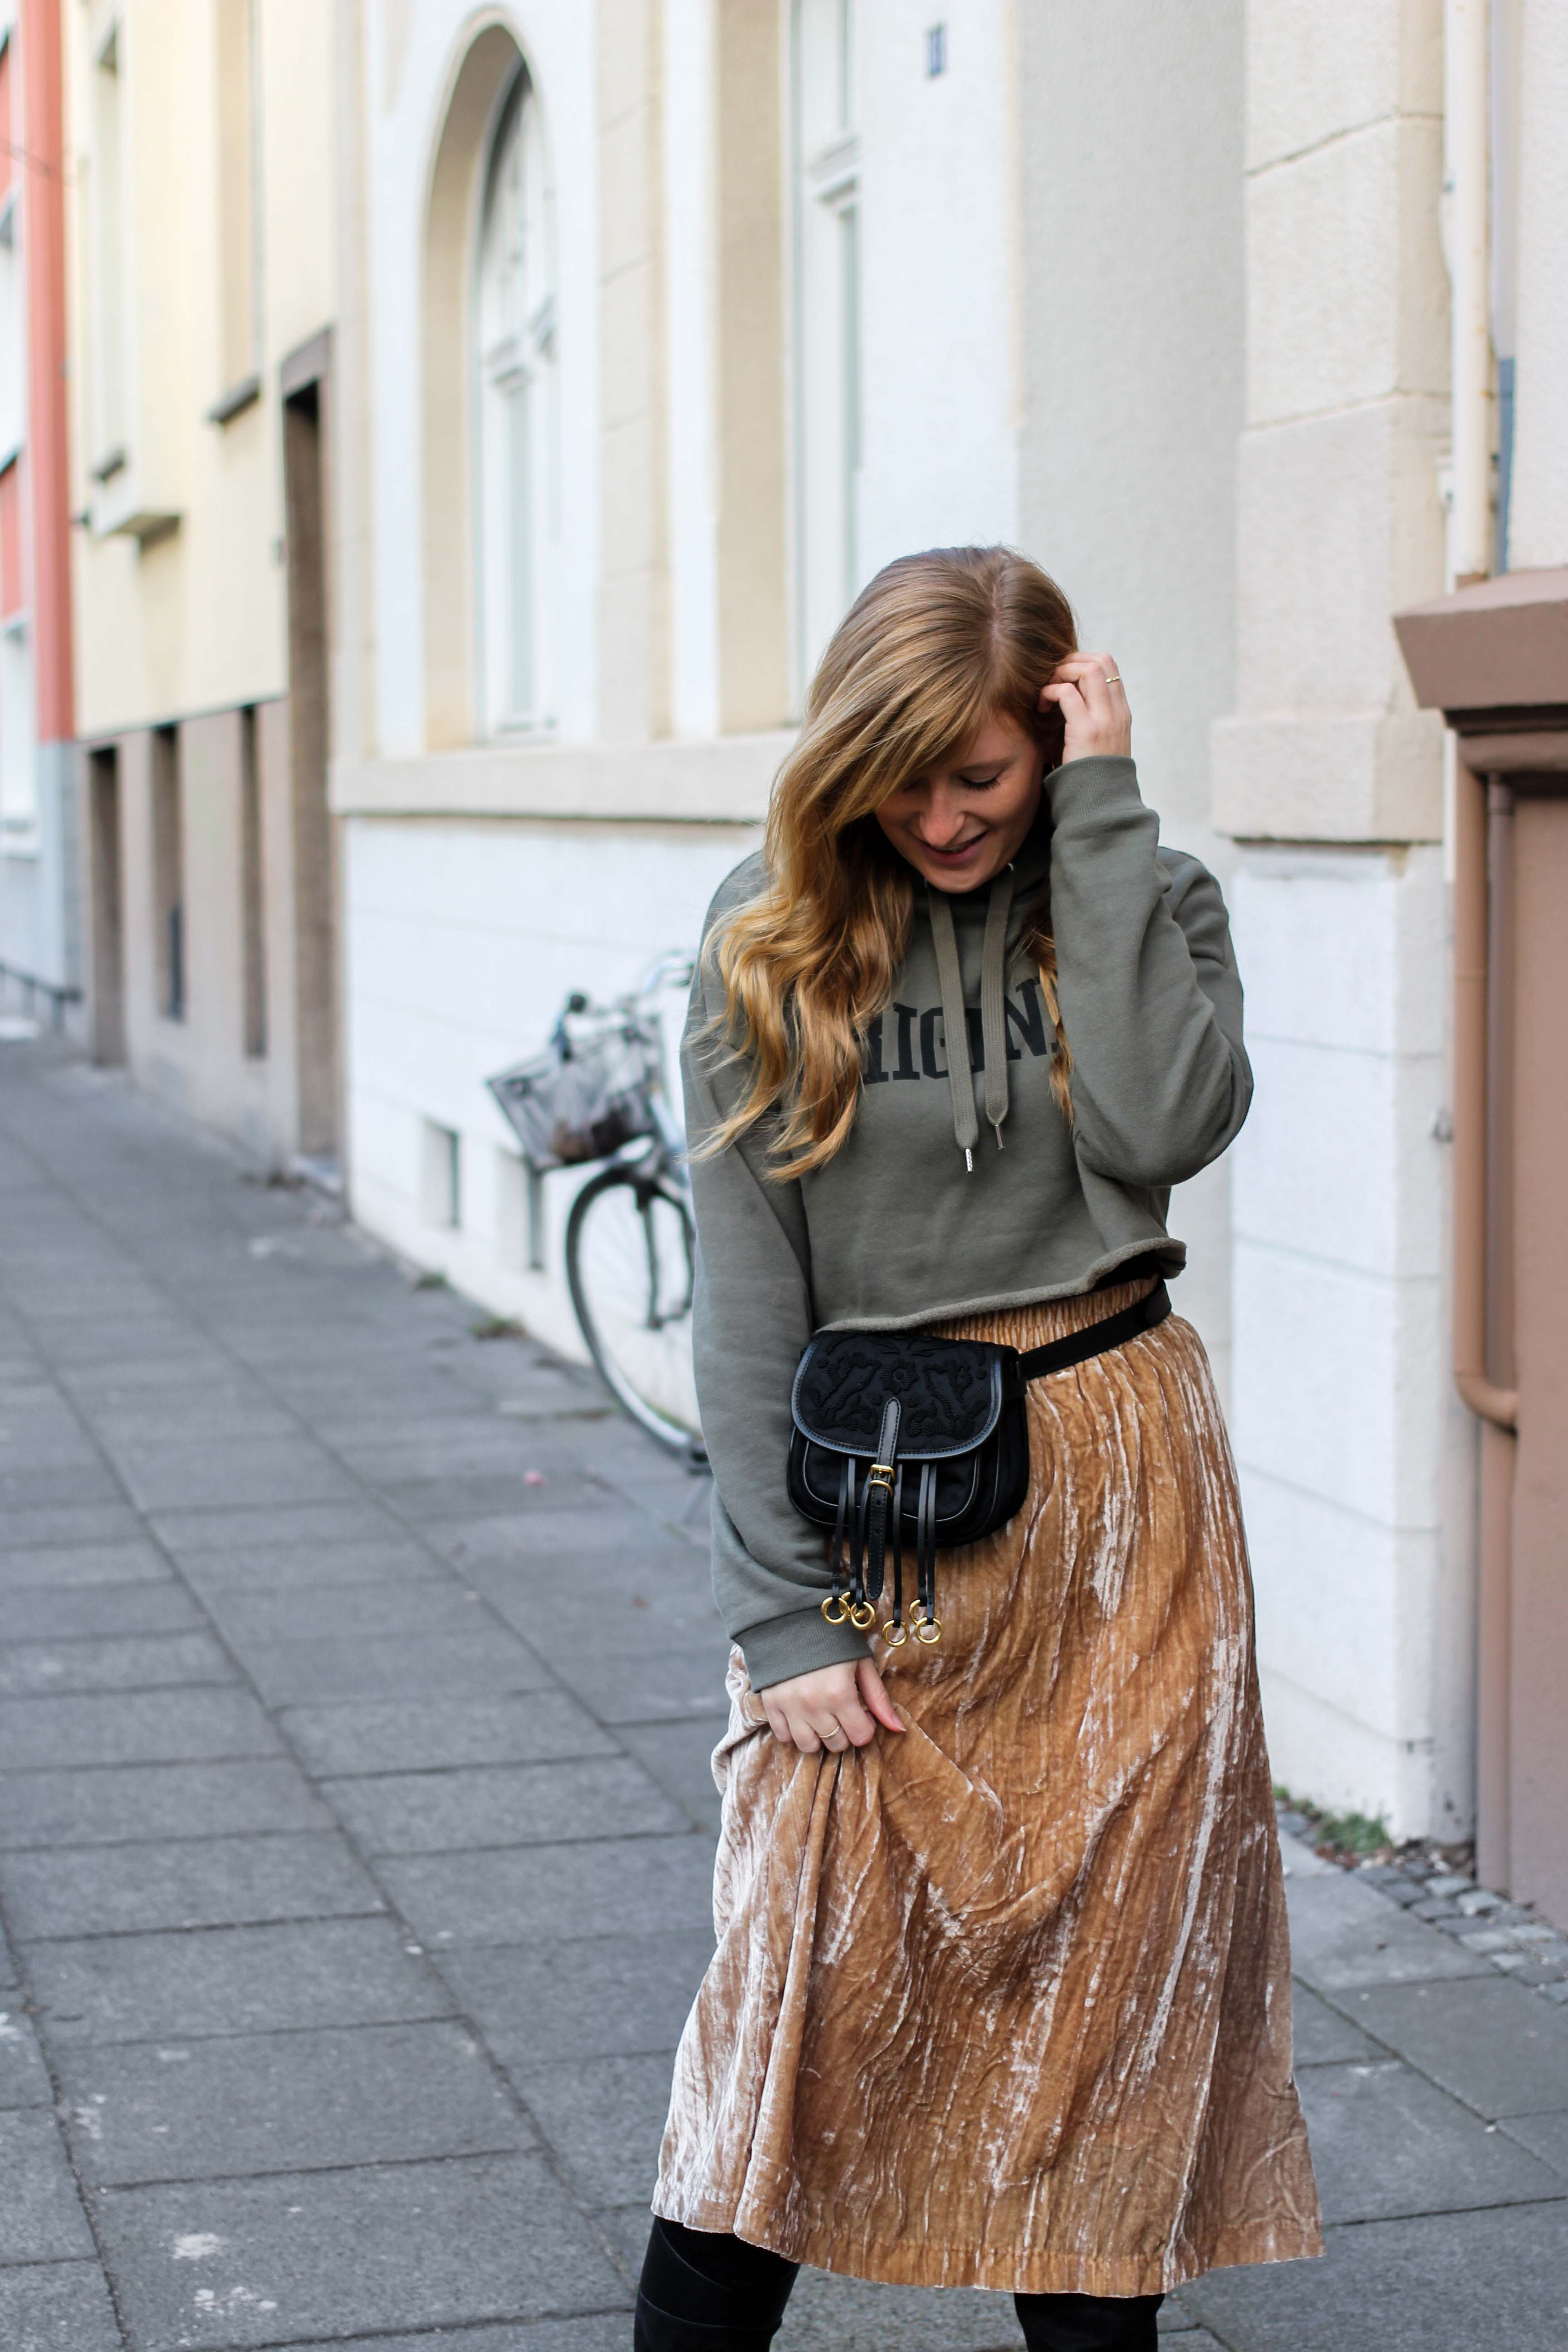 Trendtasche 2019 Gürteltasche kombiniern Gürteltasche Prada Streetstyle Outfit Bonn Frühling Look Crop Pullover 92